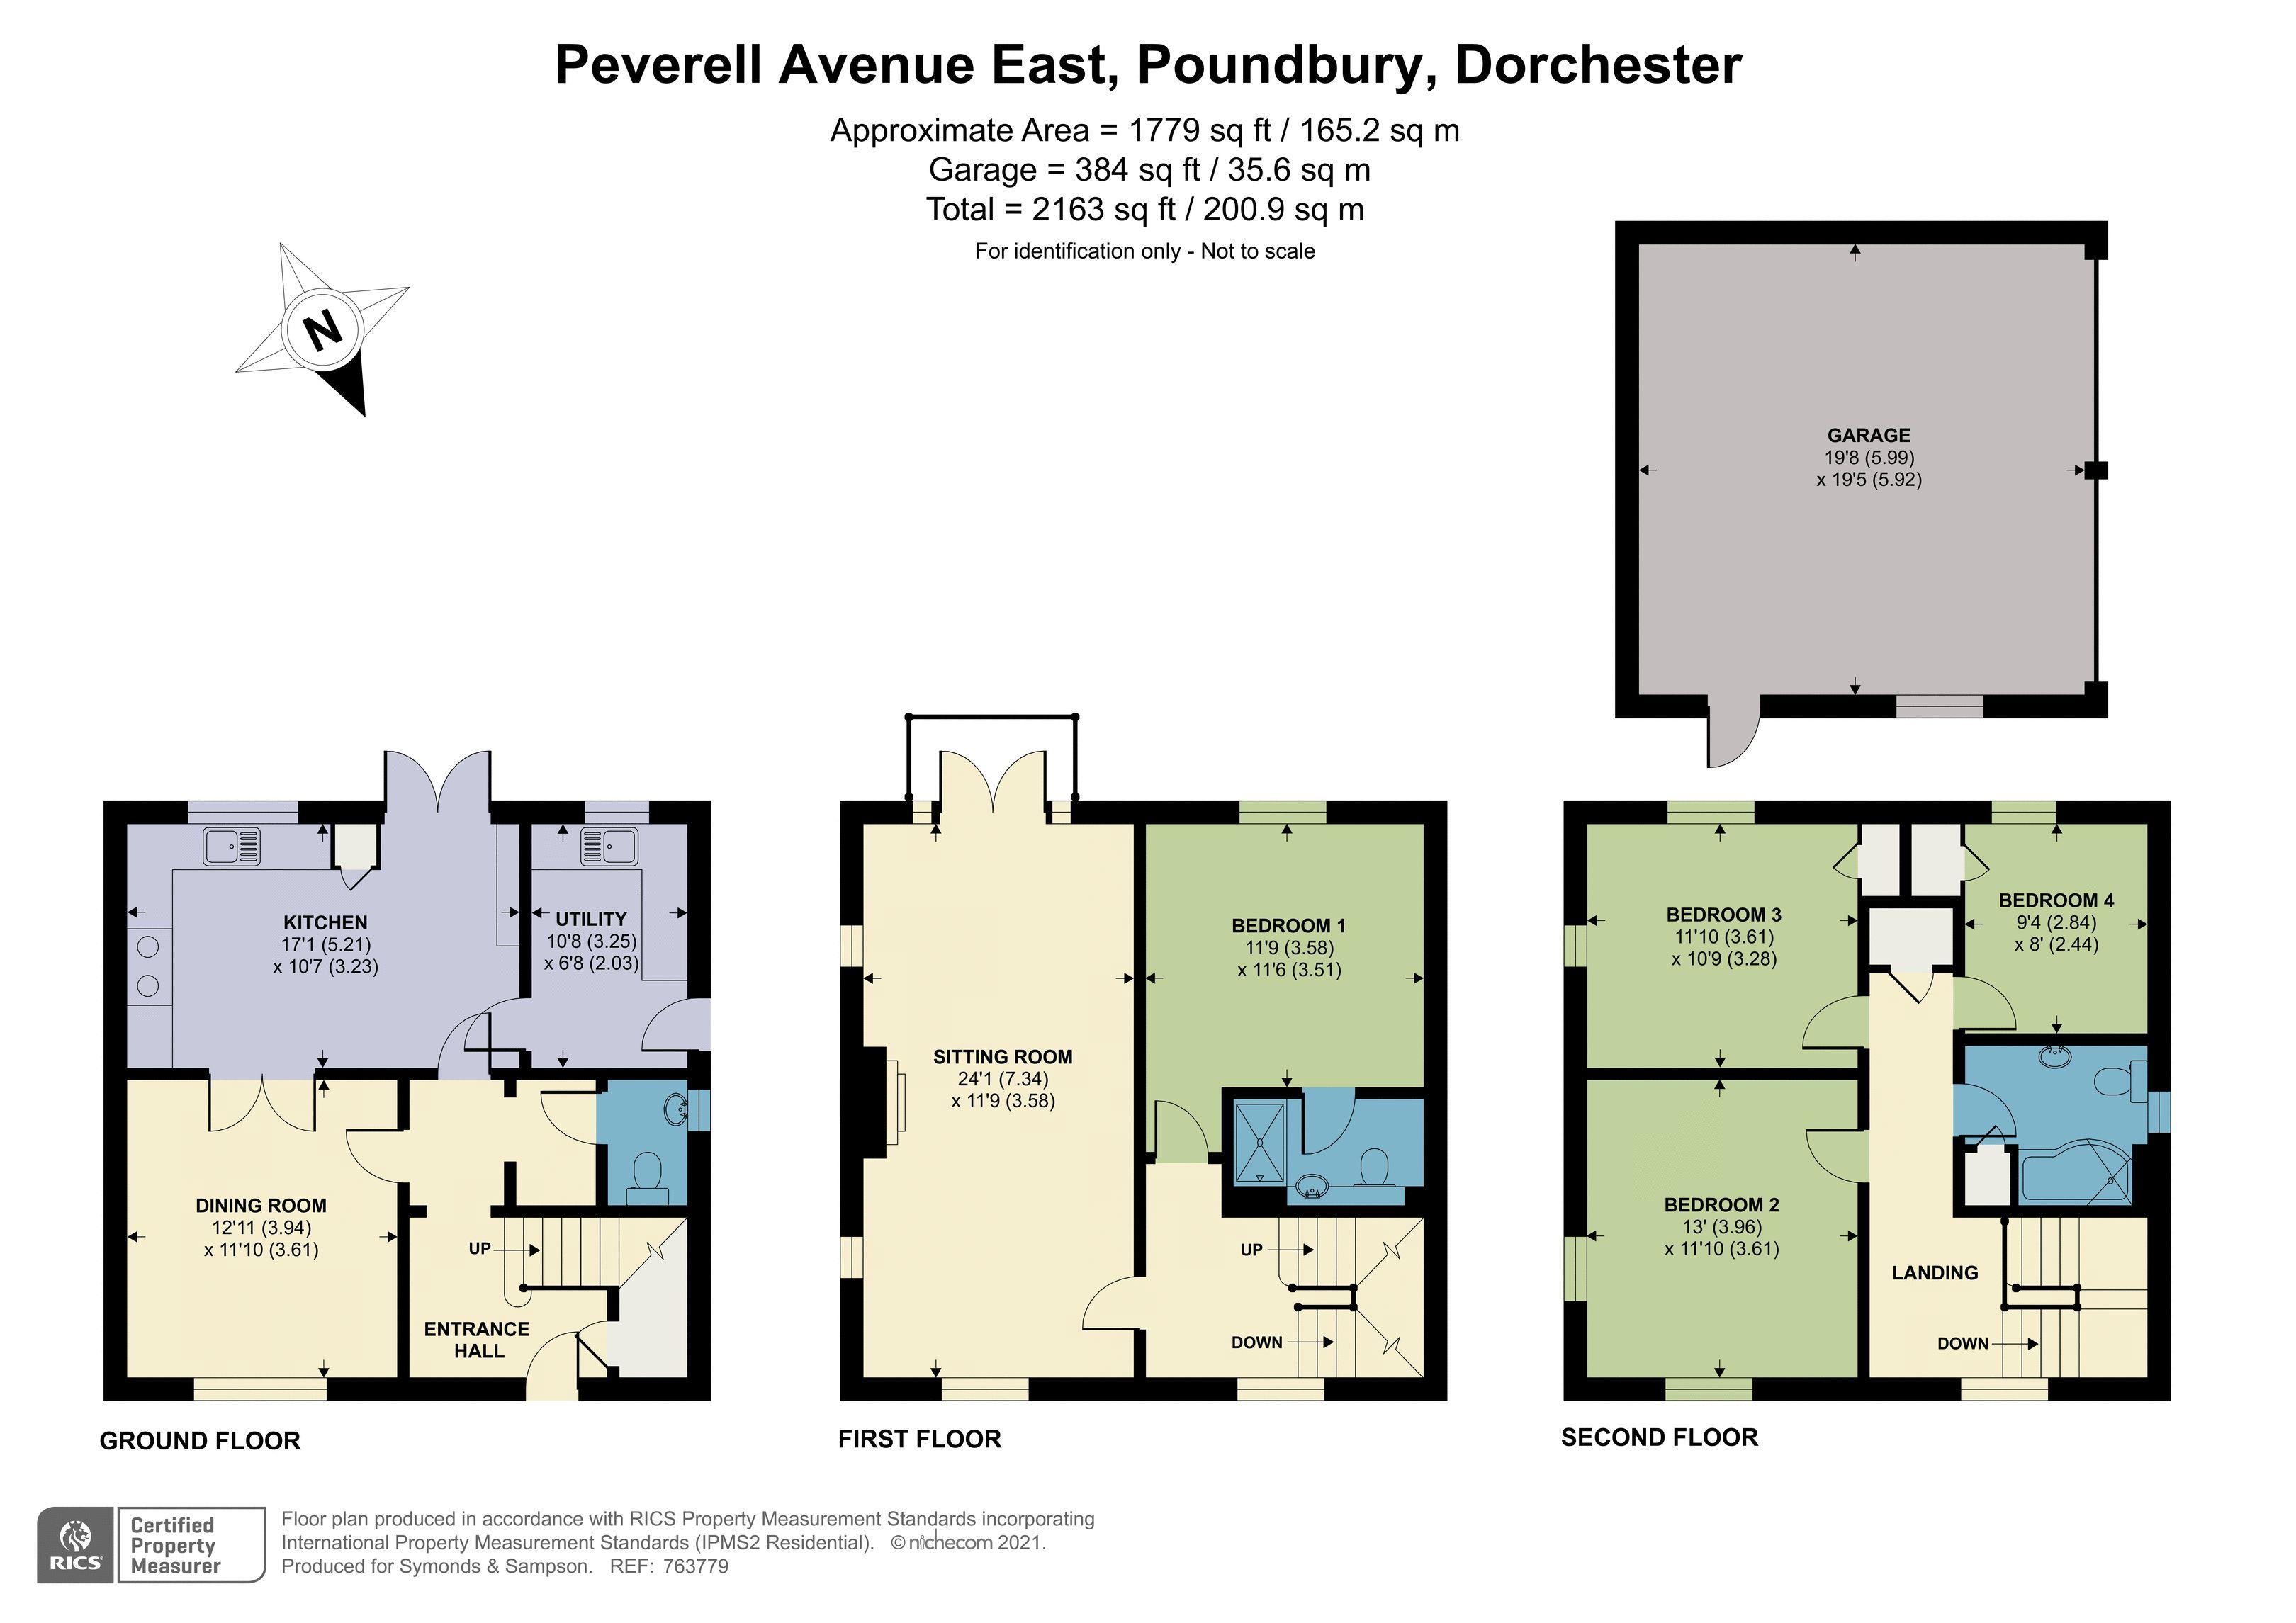 Floorplan - Peverell Avenue East, Poundbury, Dorchester, Dorset, DT1 3RH